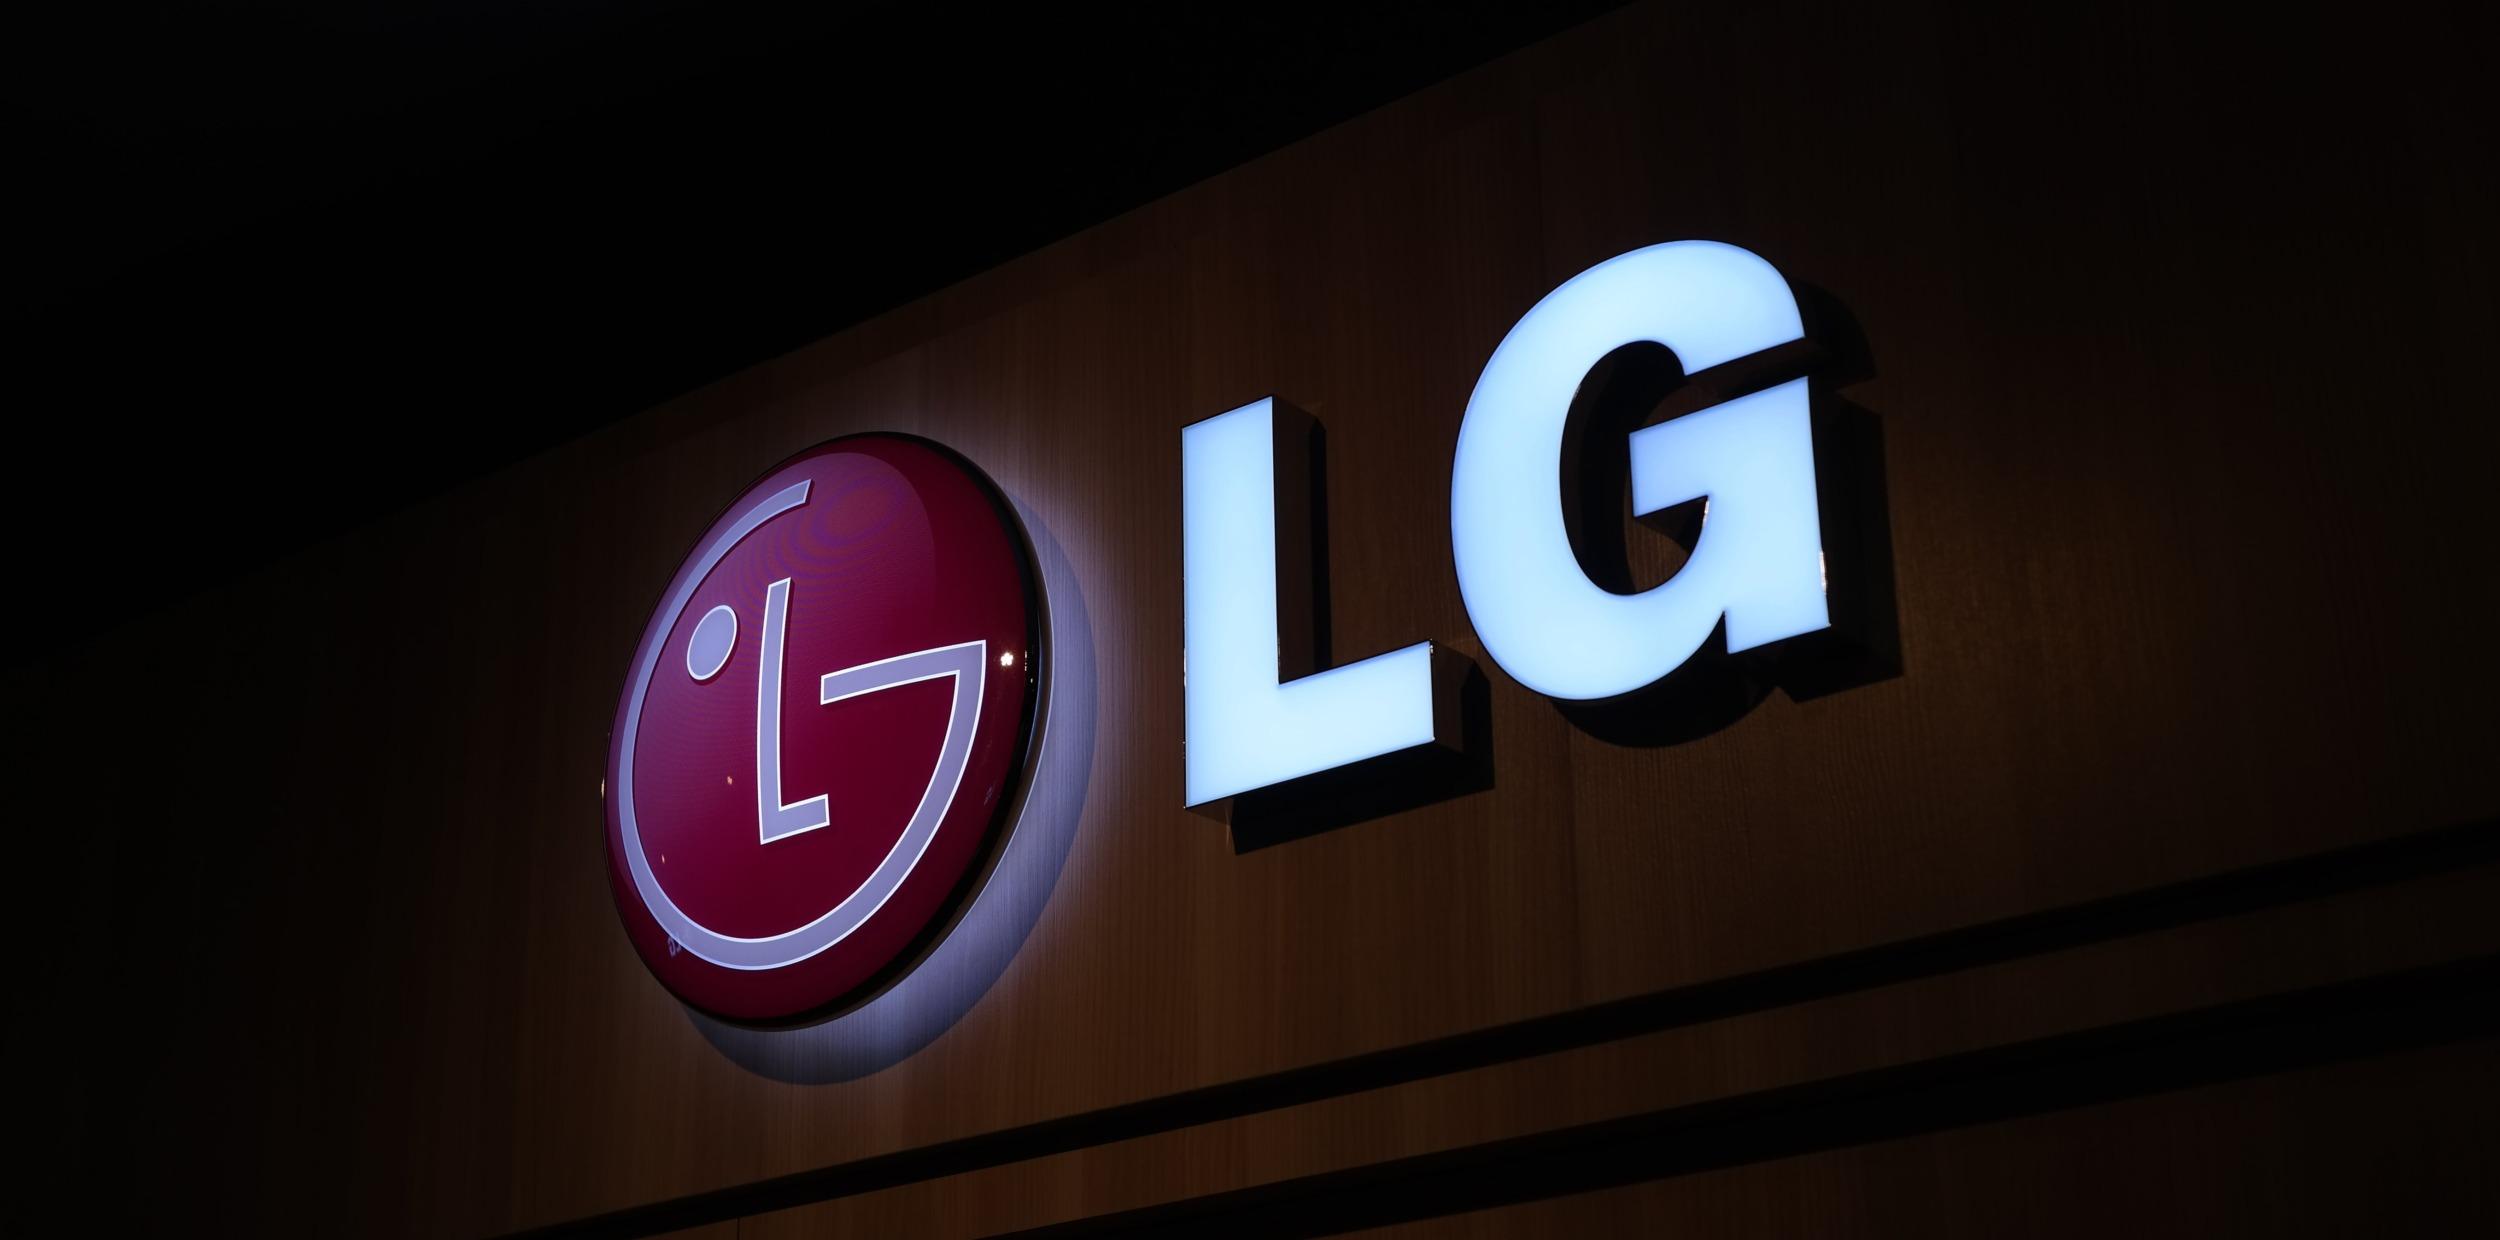 LG Q92 5G se poodhaluje, podobá se modelu Velvet [aktualizováno]